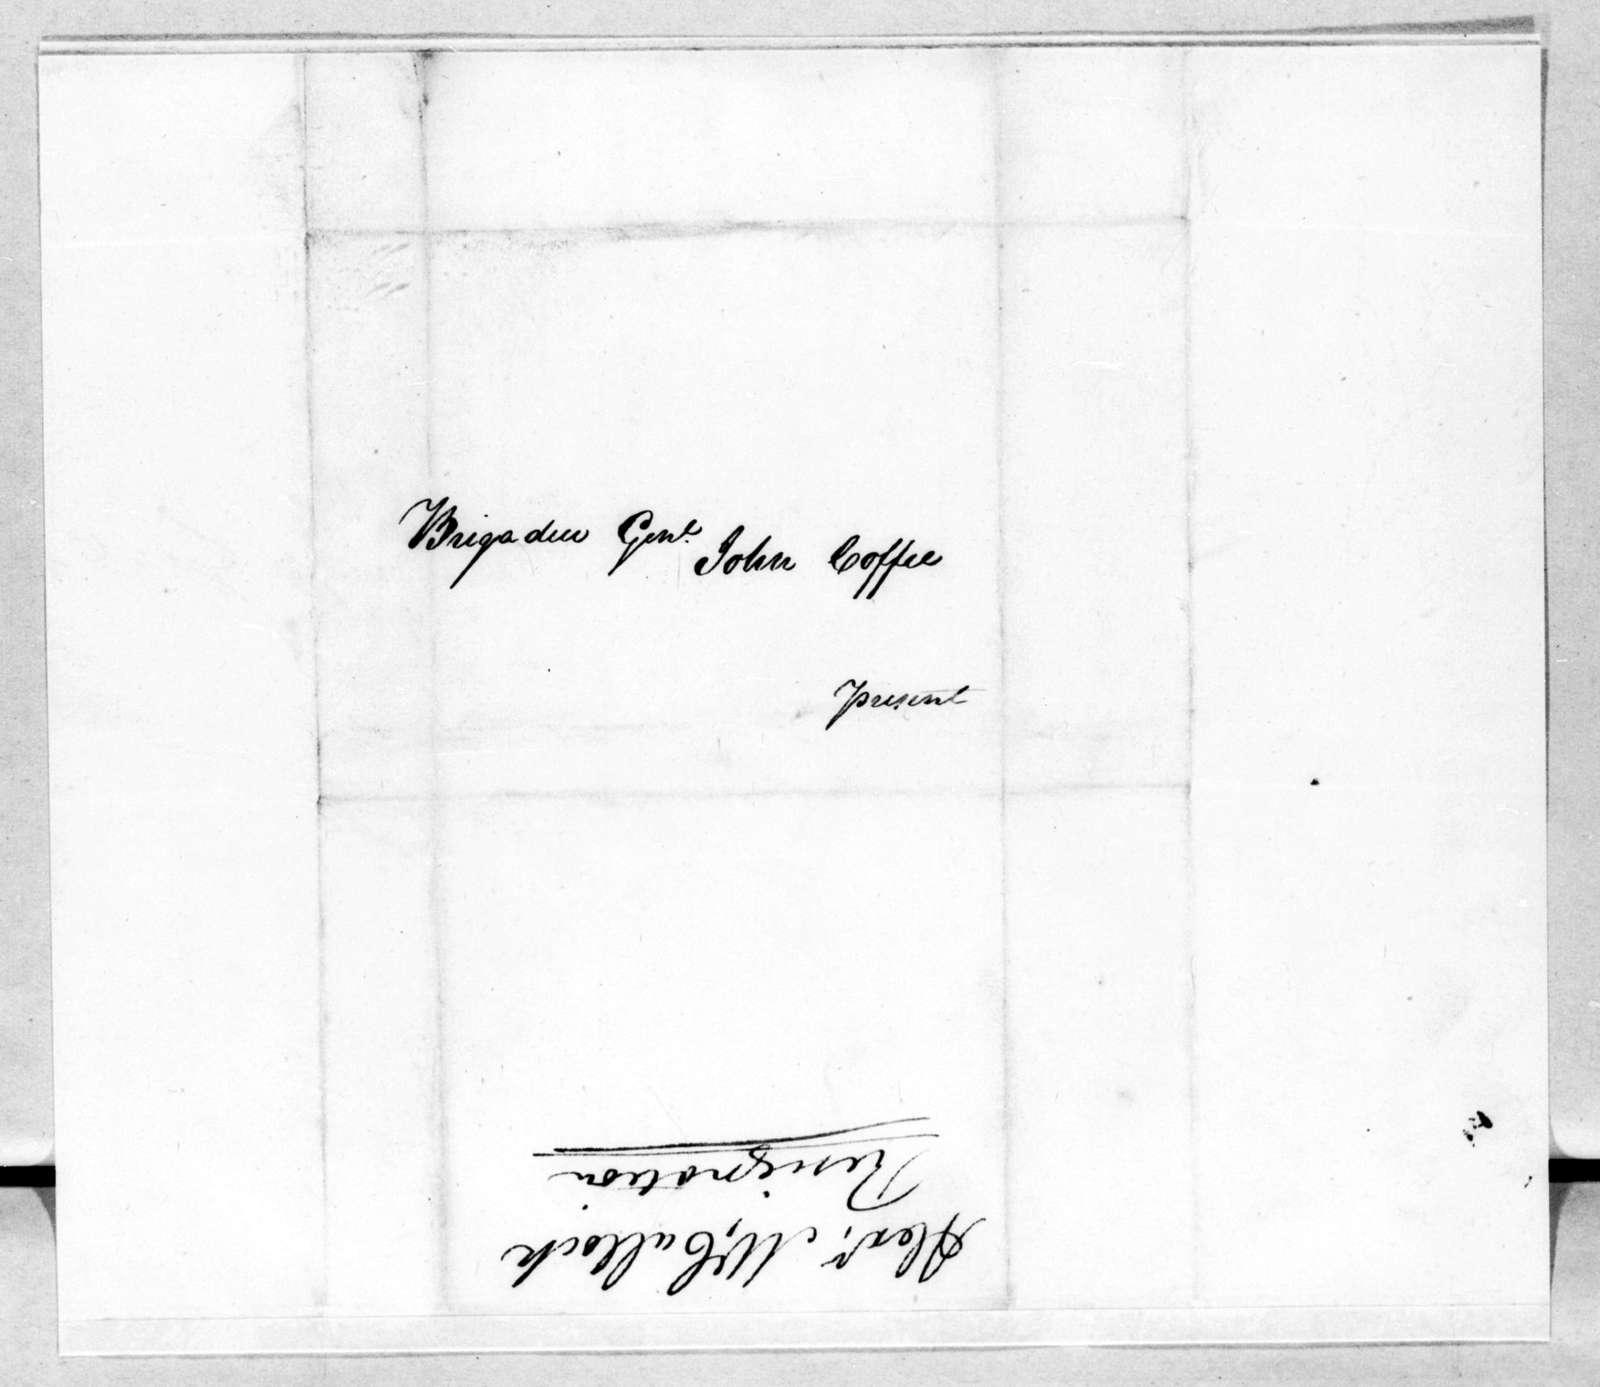 Alexander McCulloch to John Coffee, November 17, 1814